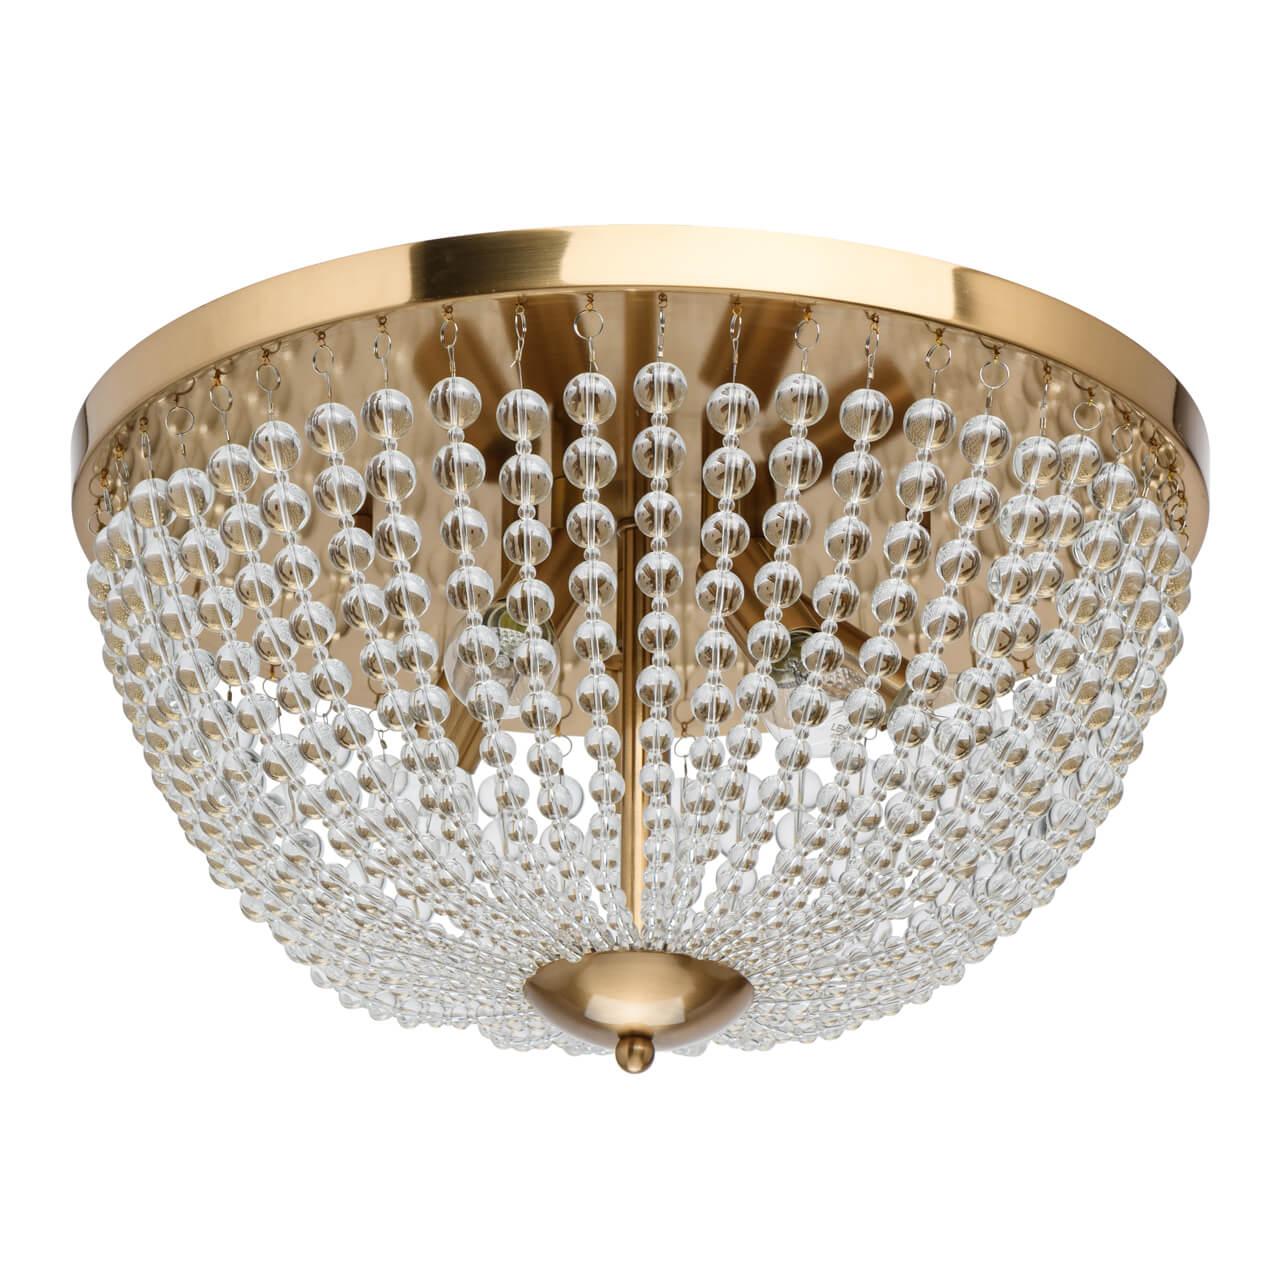 Светильник MW-Light 111012305 Бриз светильник подвесной mw light бриз 464012201